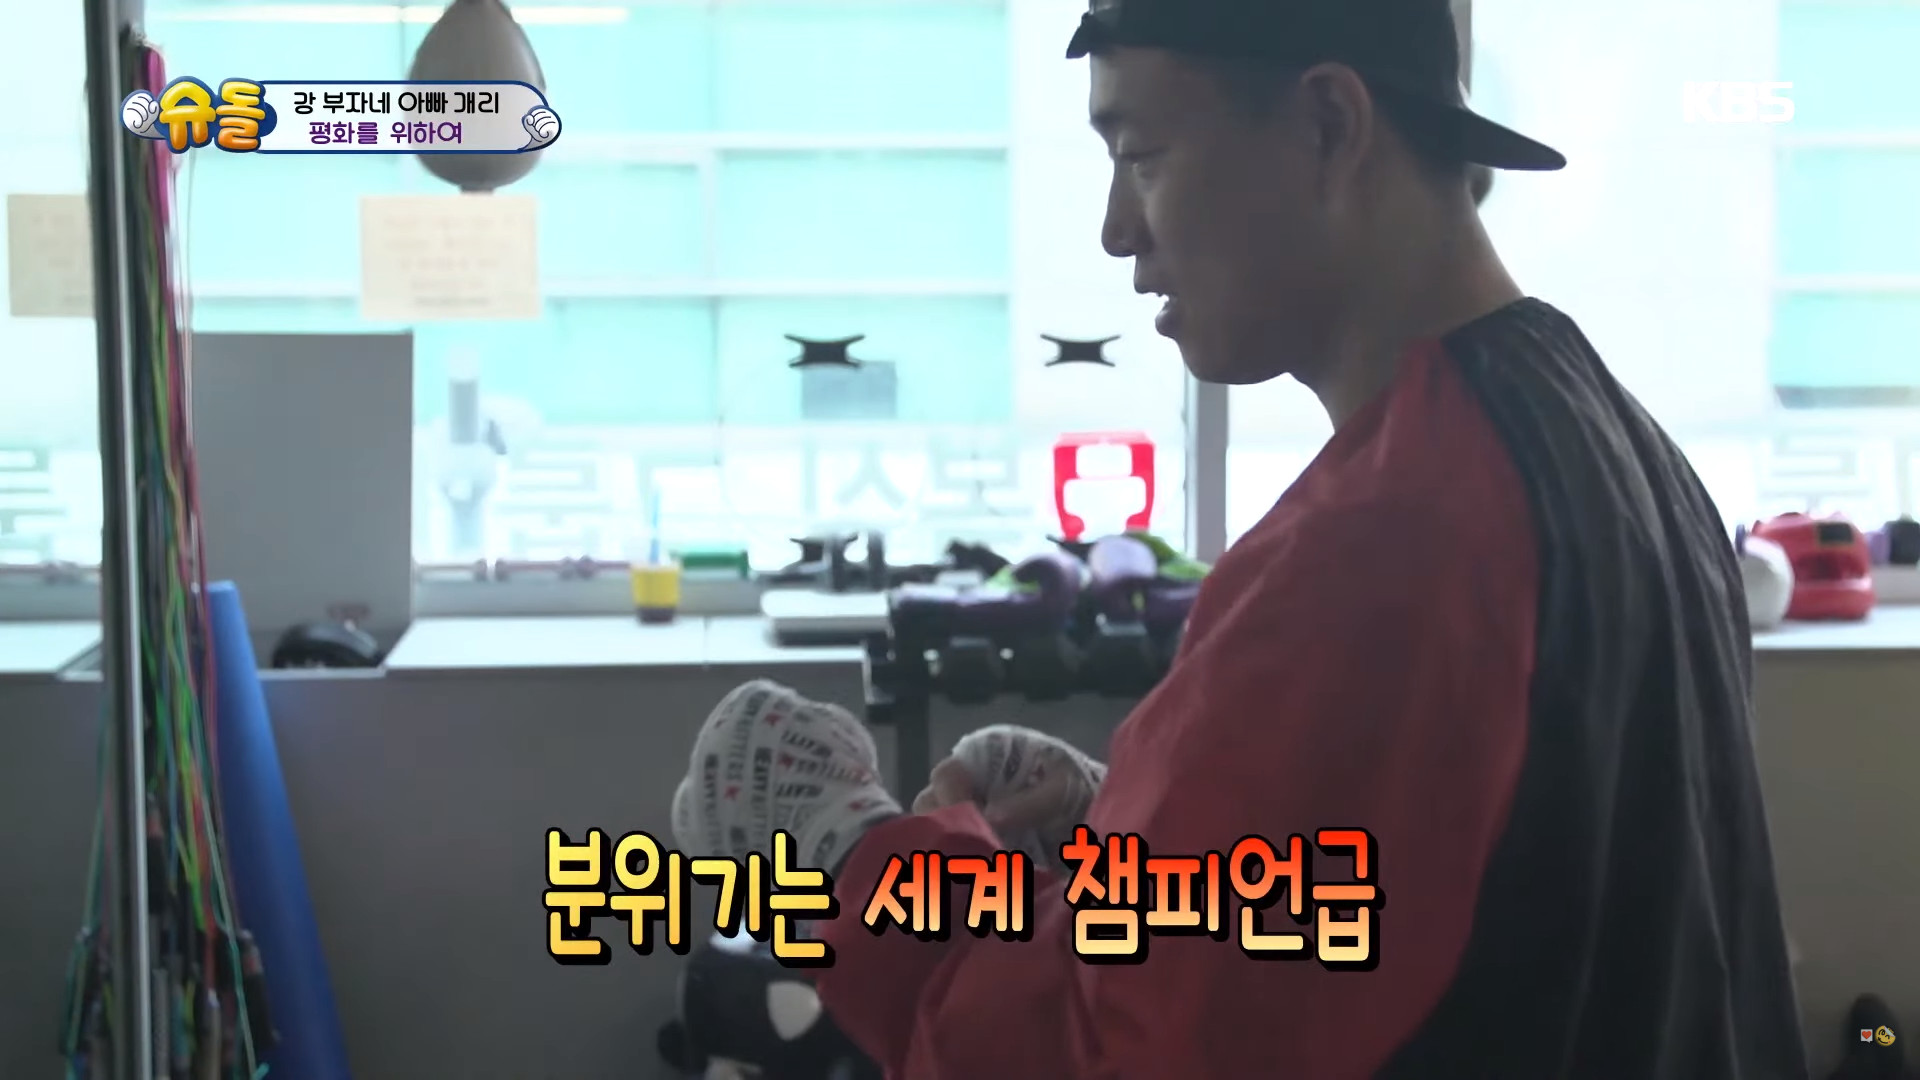 ▲▼Gary帶著一歲多的兒子錄製《我的超人爸爸》(圖/翻攝自Youtube@KBS Entertain)